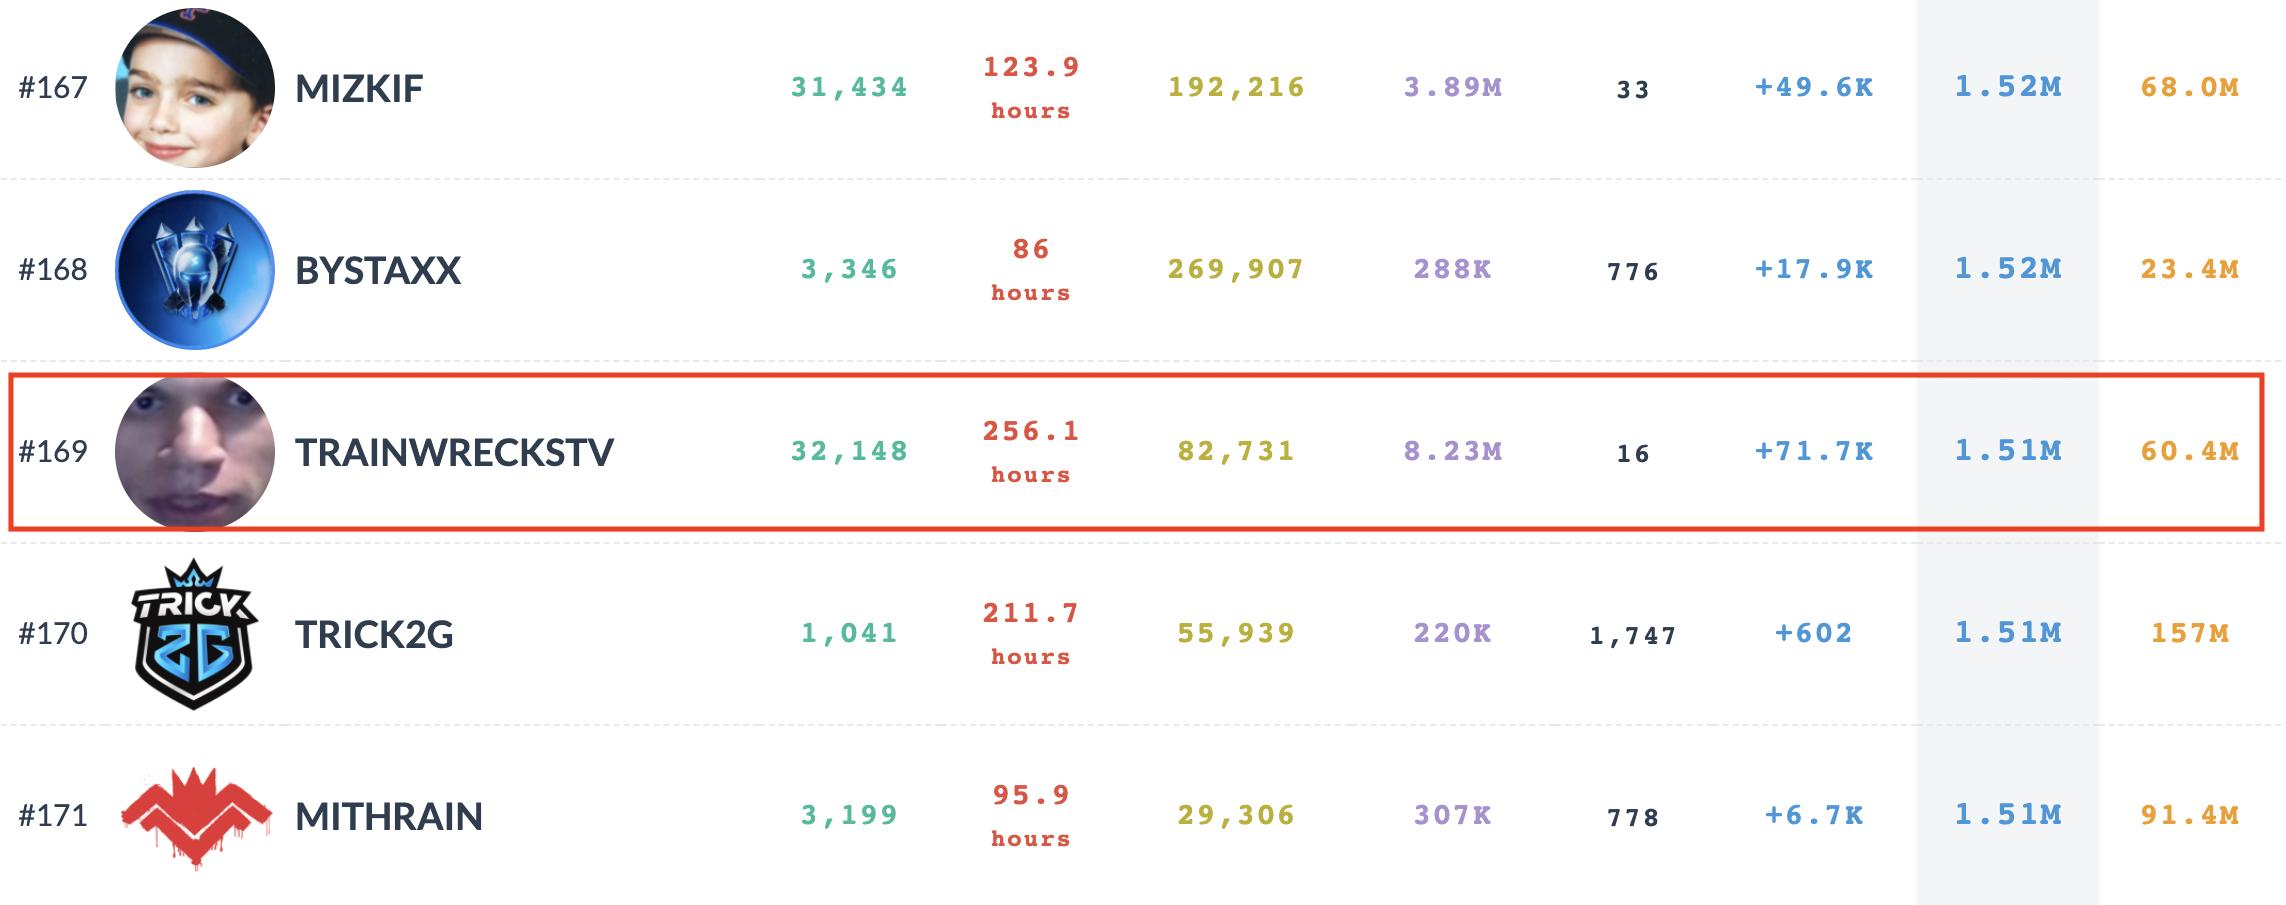 TrainwrecksTV rank among other popular Twitch streamers.